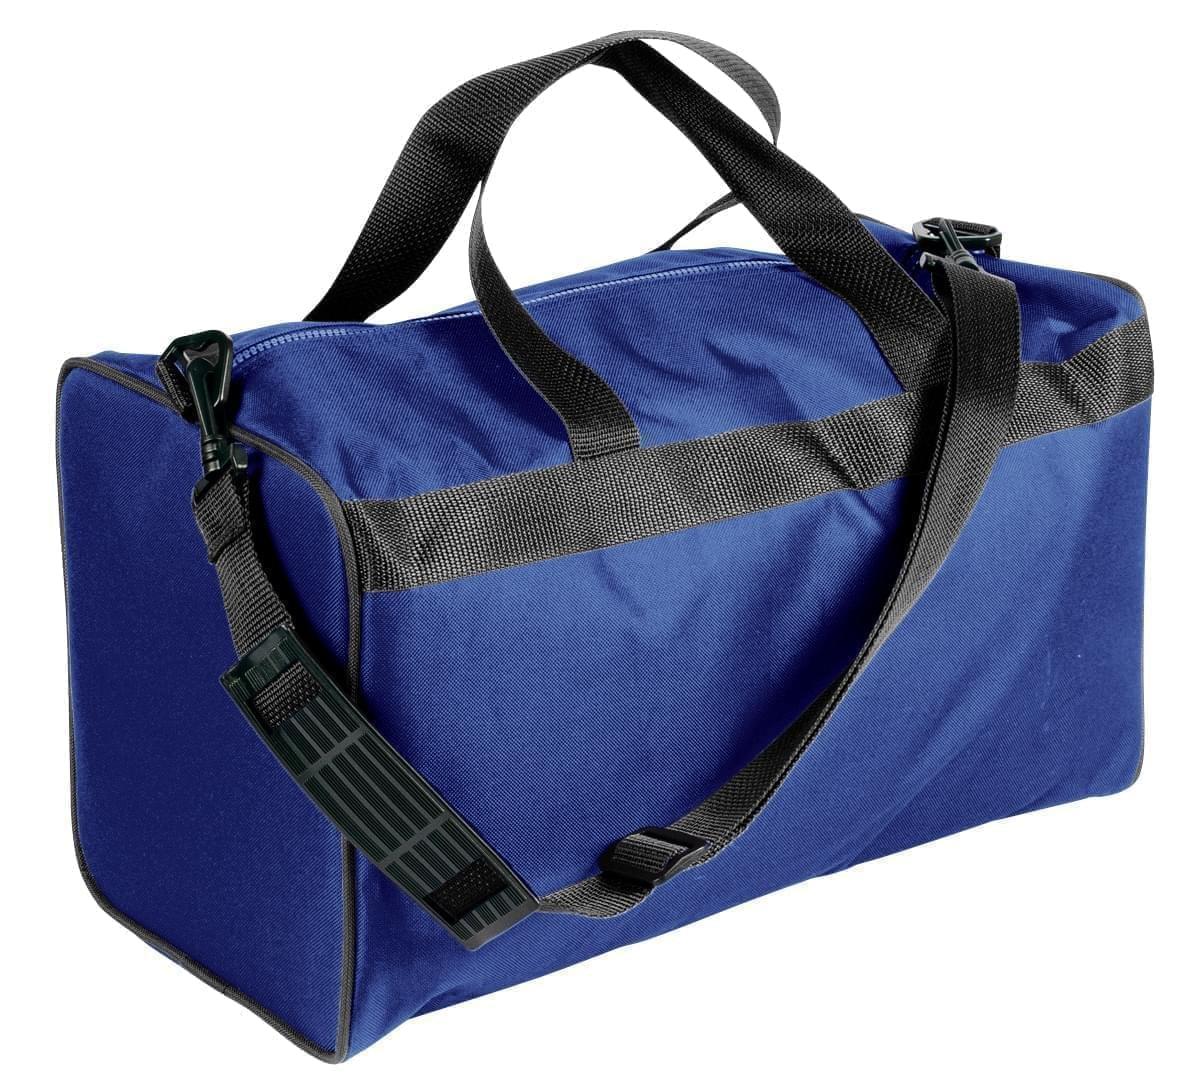 USA Made Nylon Poly Weekend Duffles, Royal Blue-Black, WLKX31AA0R